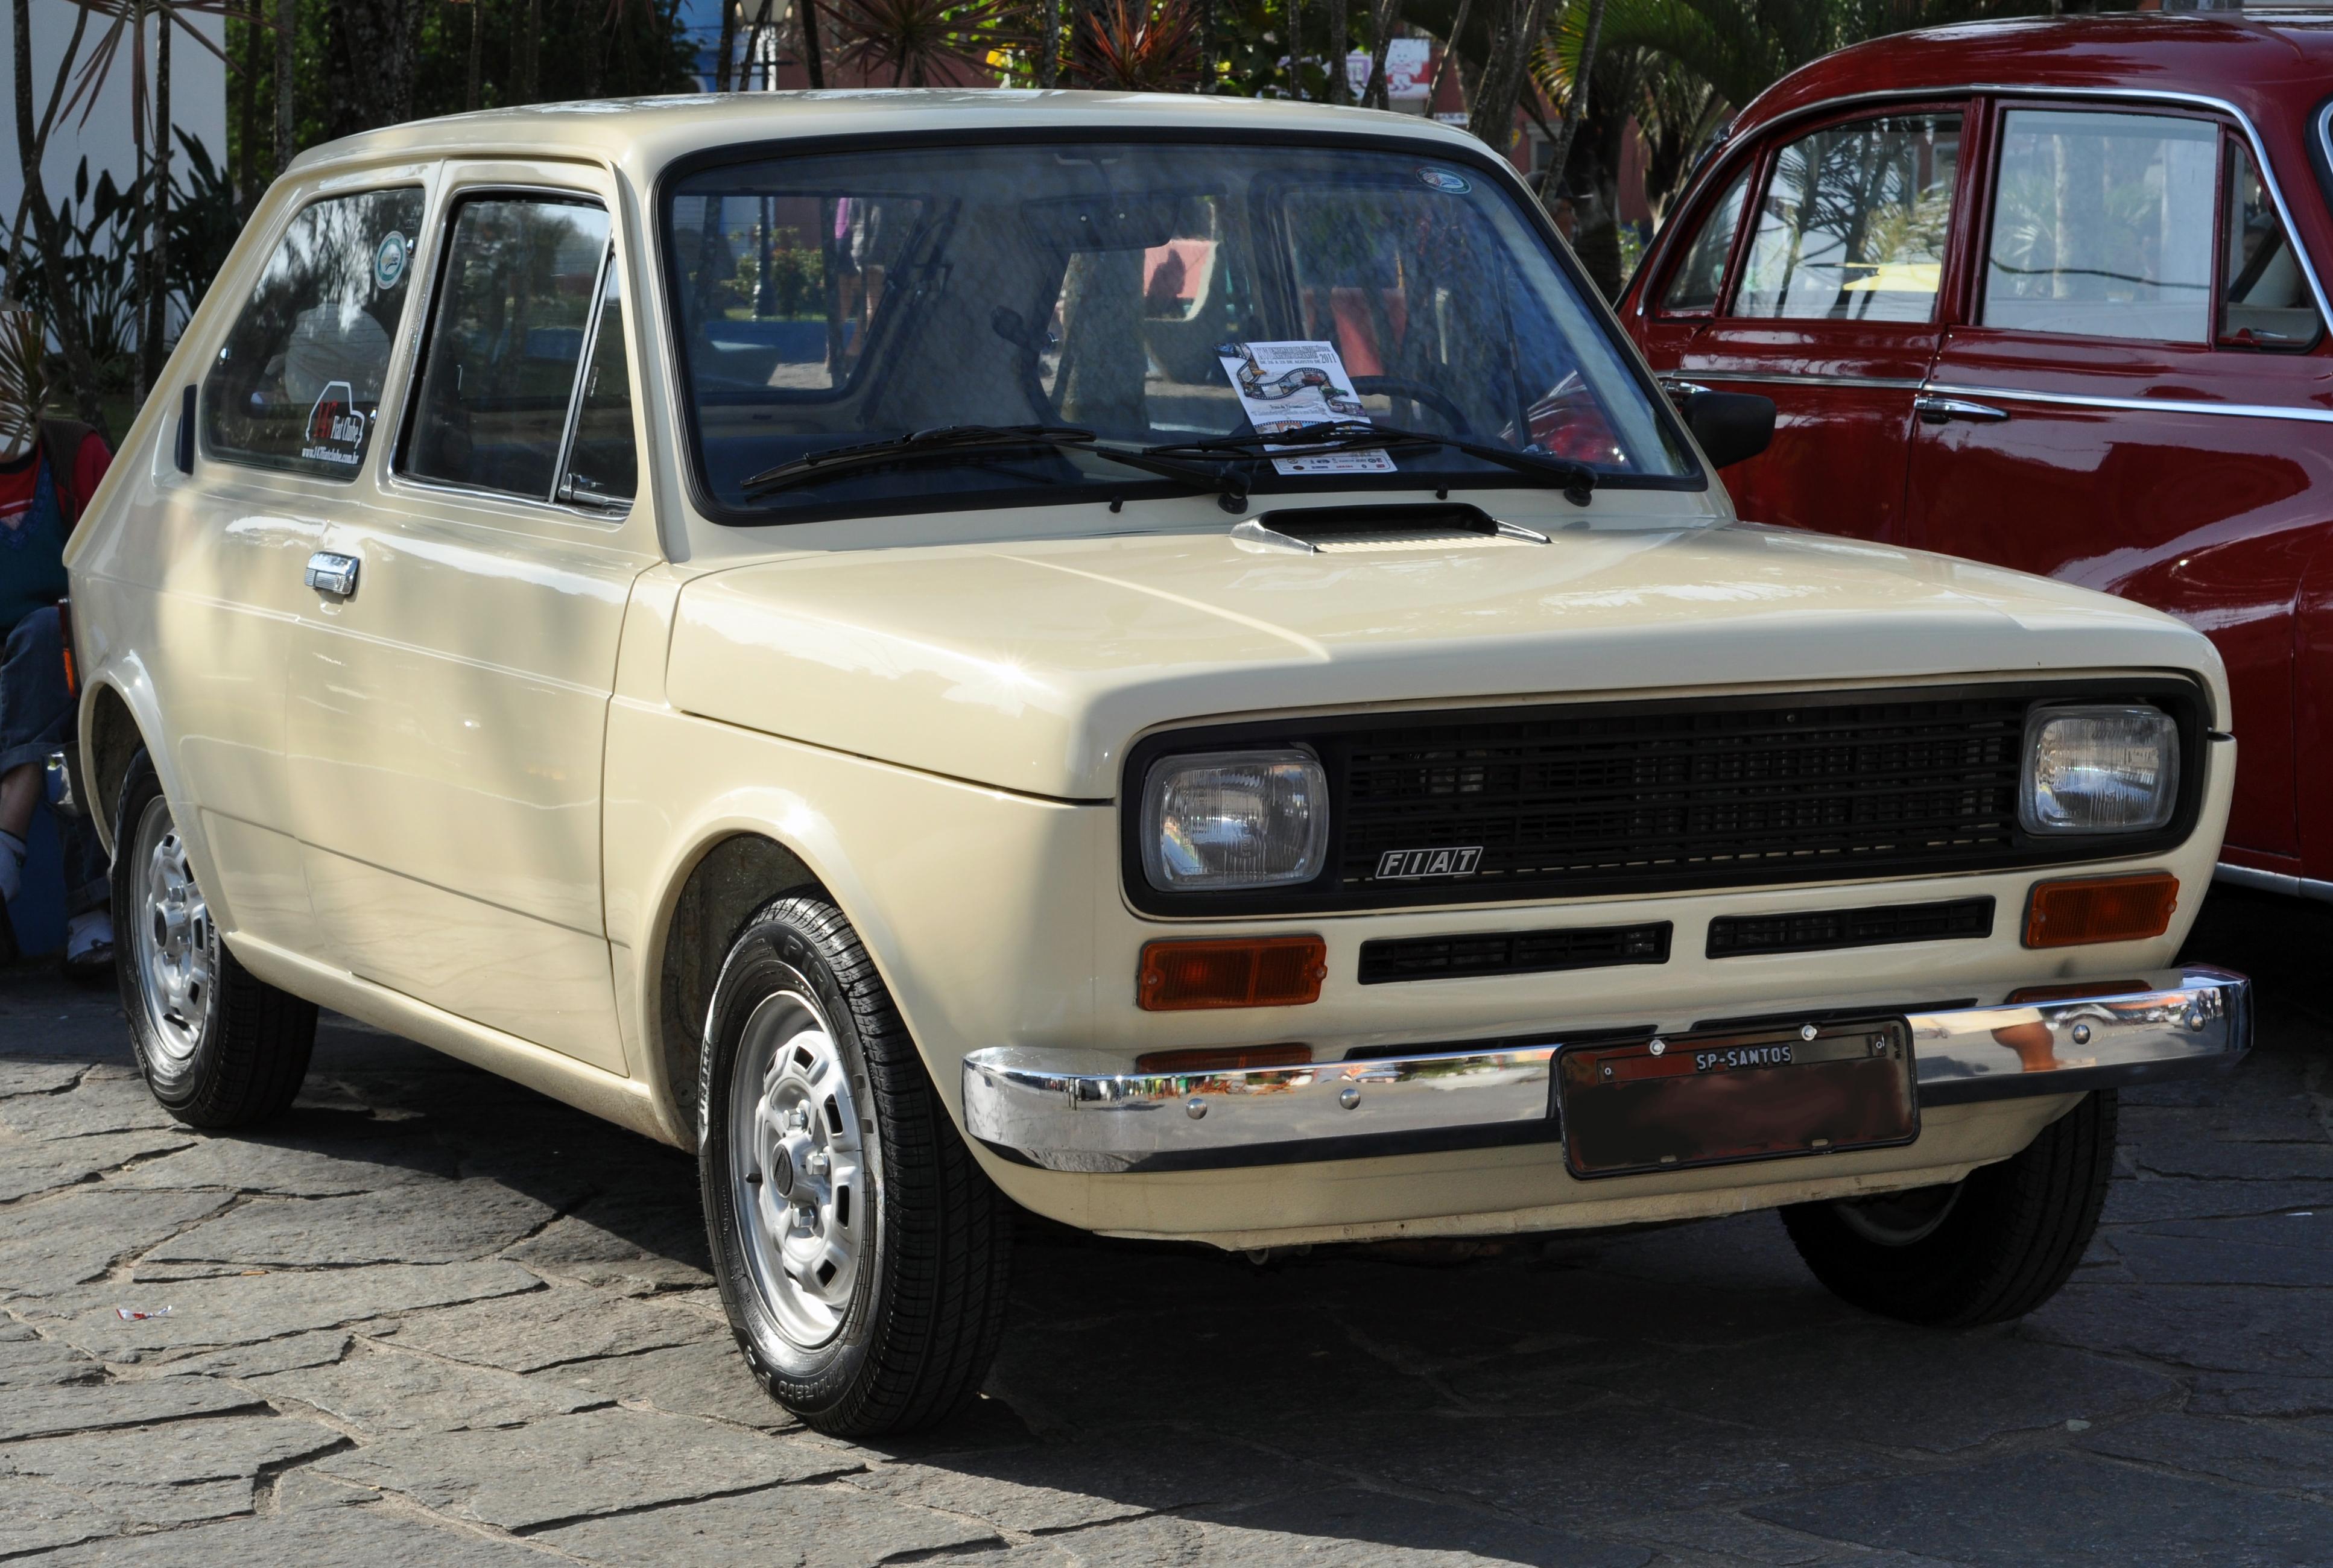 Ficheiro Early Fiat 147 Itanha 233 M Jpg Wikip 233 Dia A